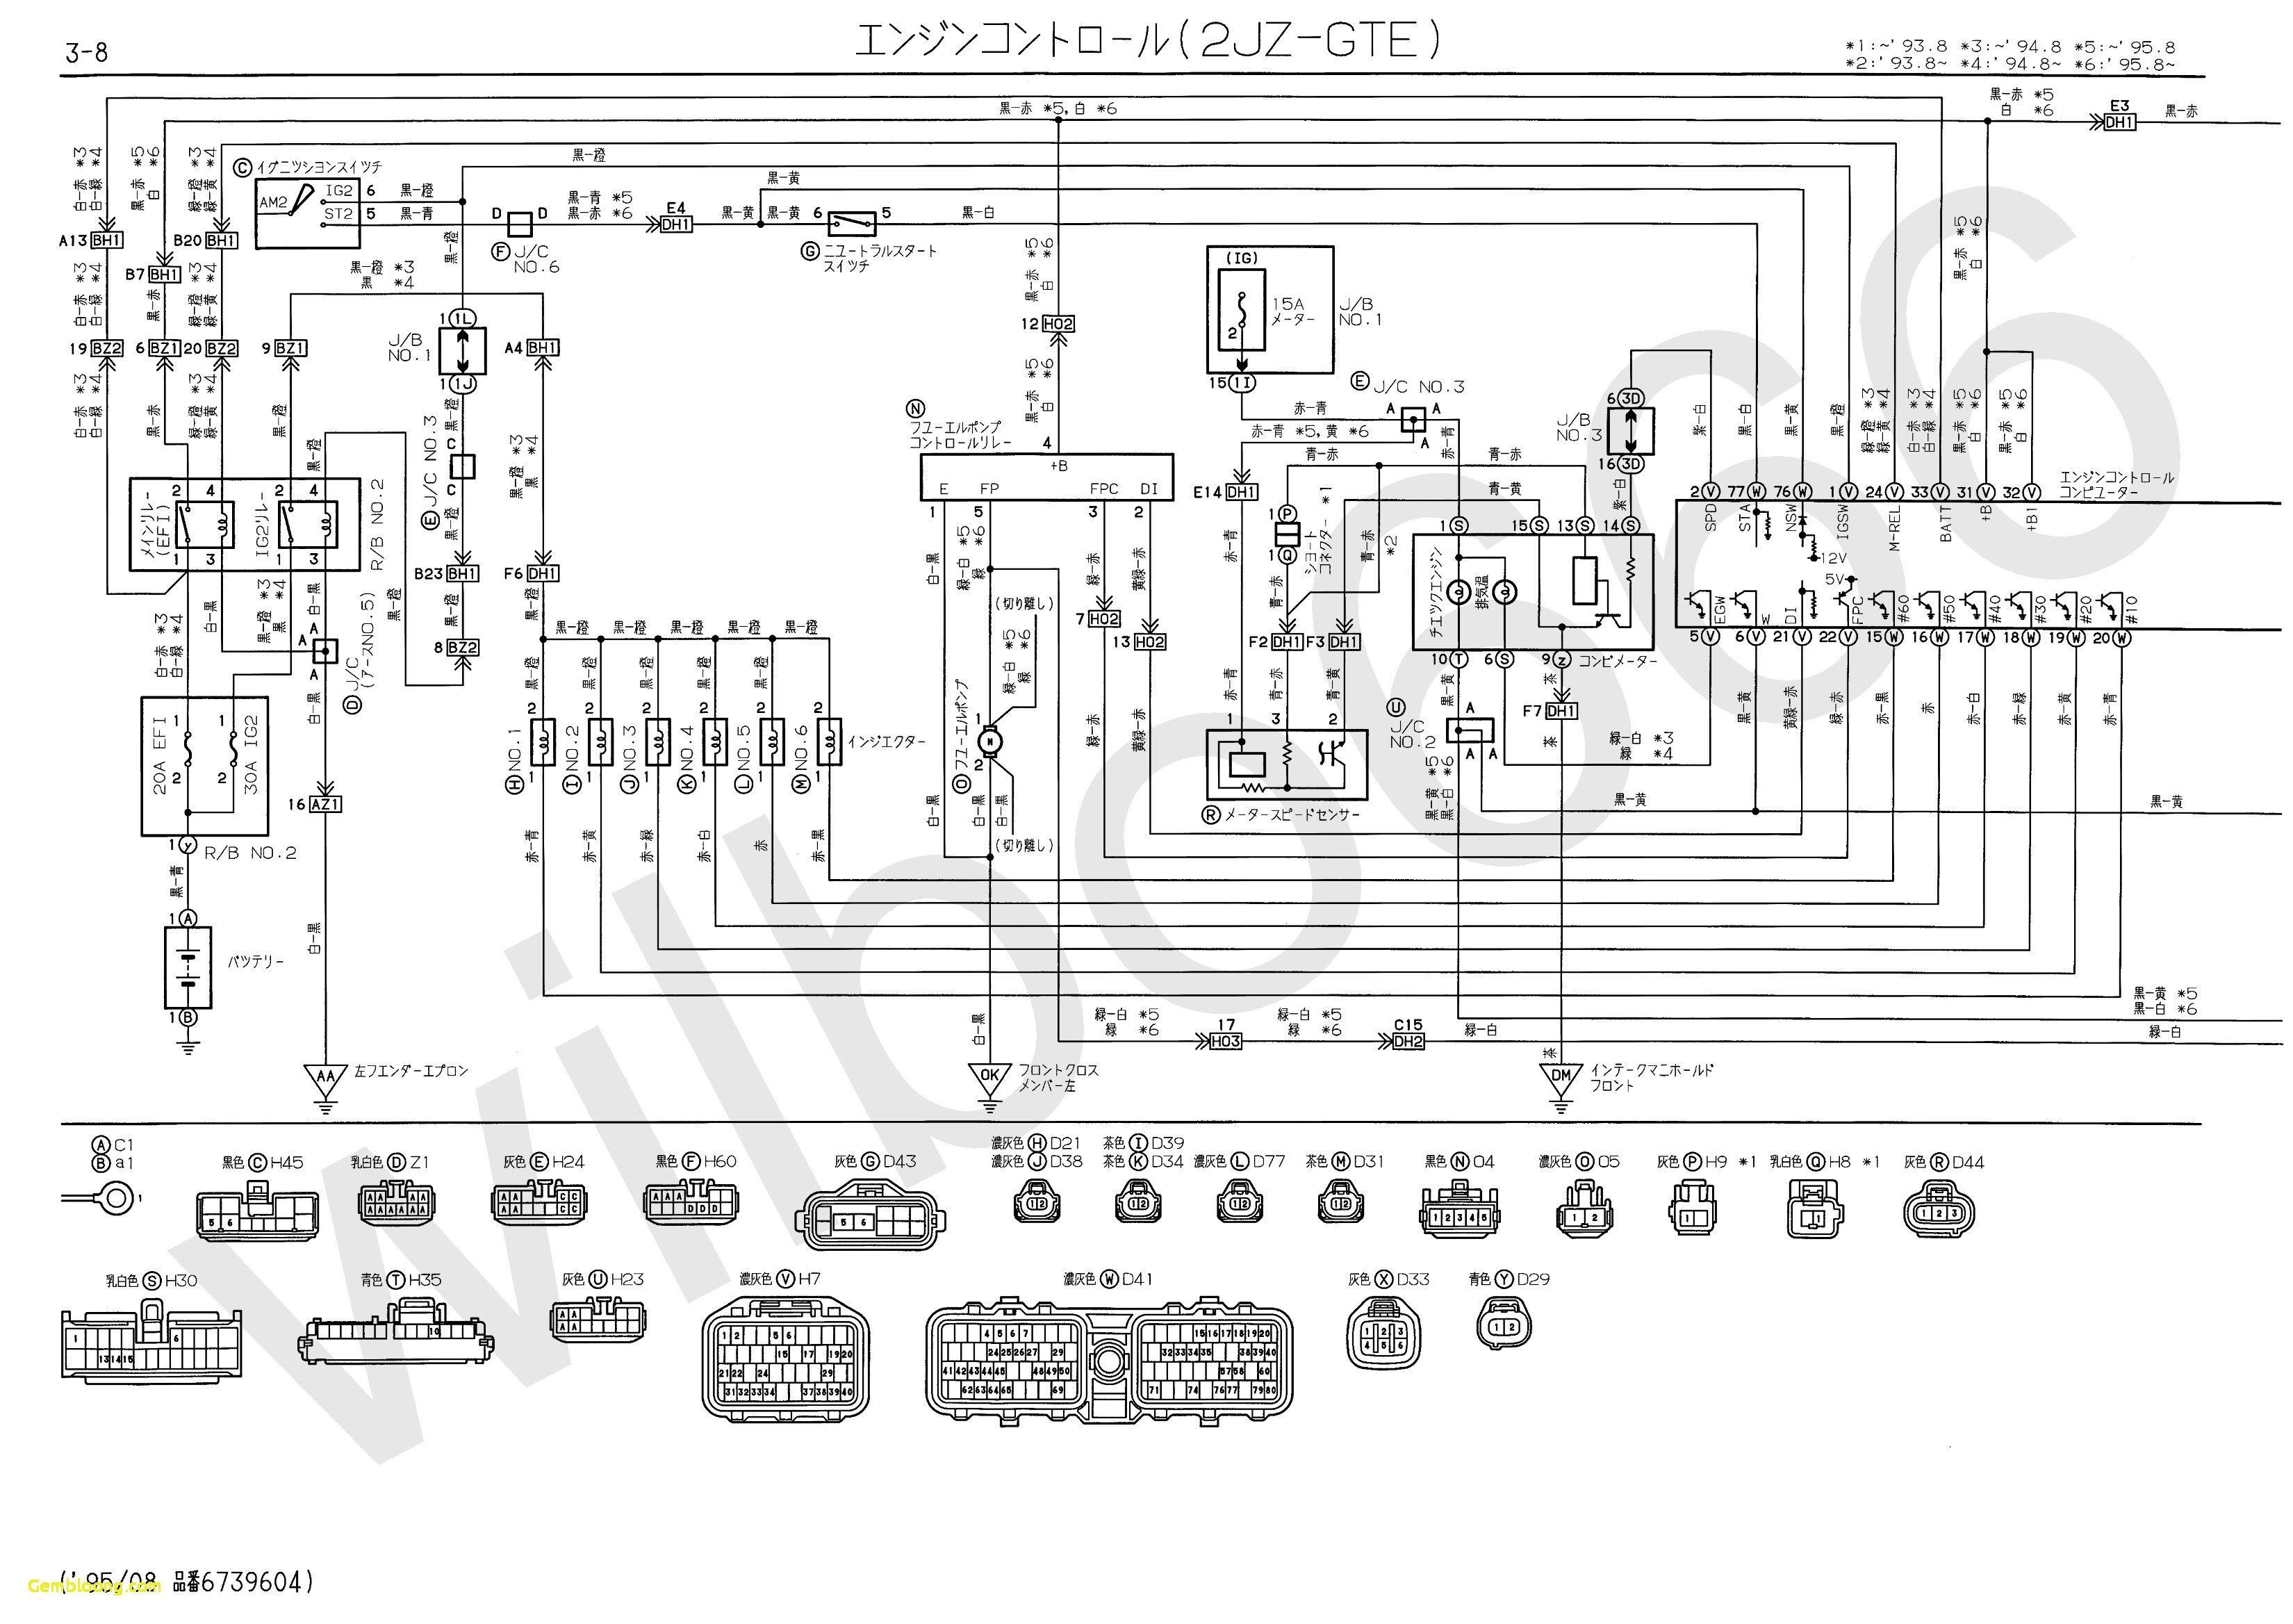 Unique Bmw E46 Engine Wiring Harness Diagram Diagram Diagramtemplate Diagramsample Electrical Diagram Electrical Circuit Diagram Electrical Wiring Diagram